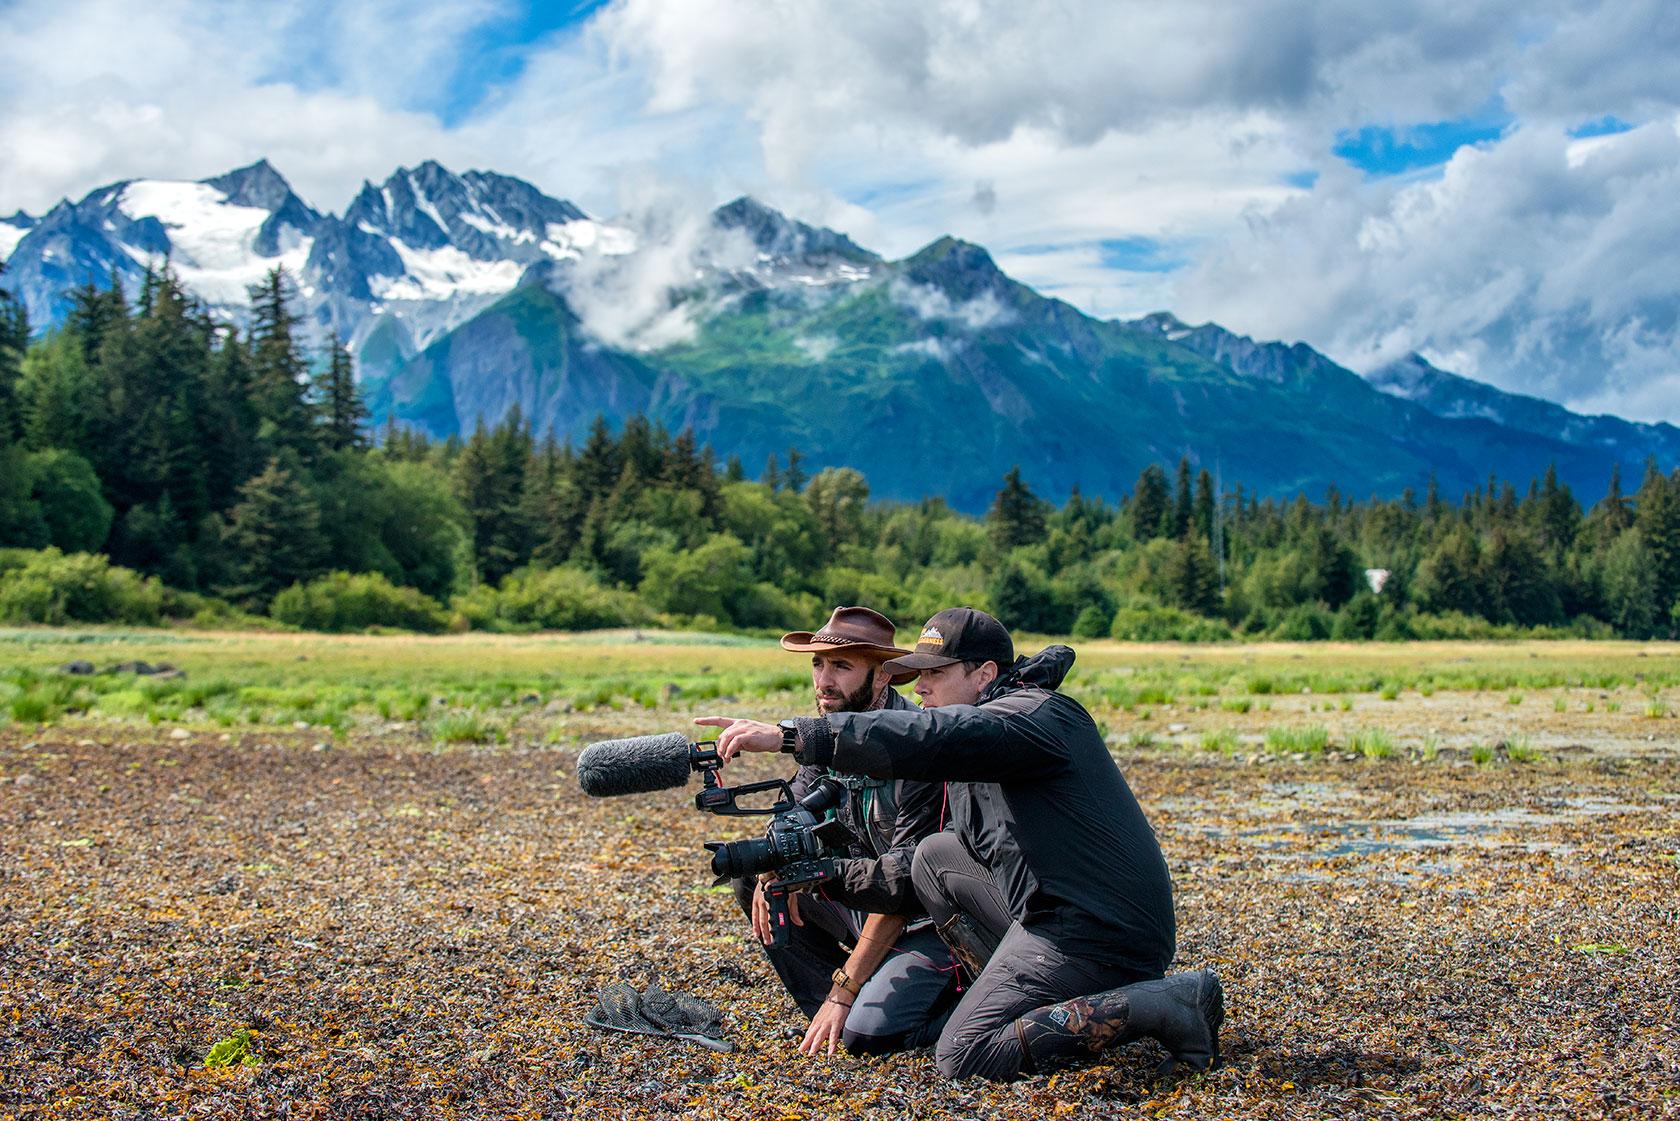 austin-trigg-brave-wilderness-alaska-BW-Mark-Coyote-Discuss-Mud-Bay.jpg